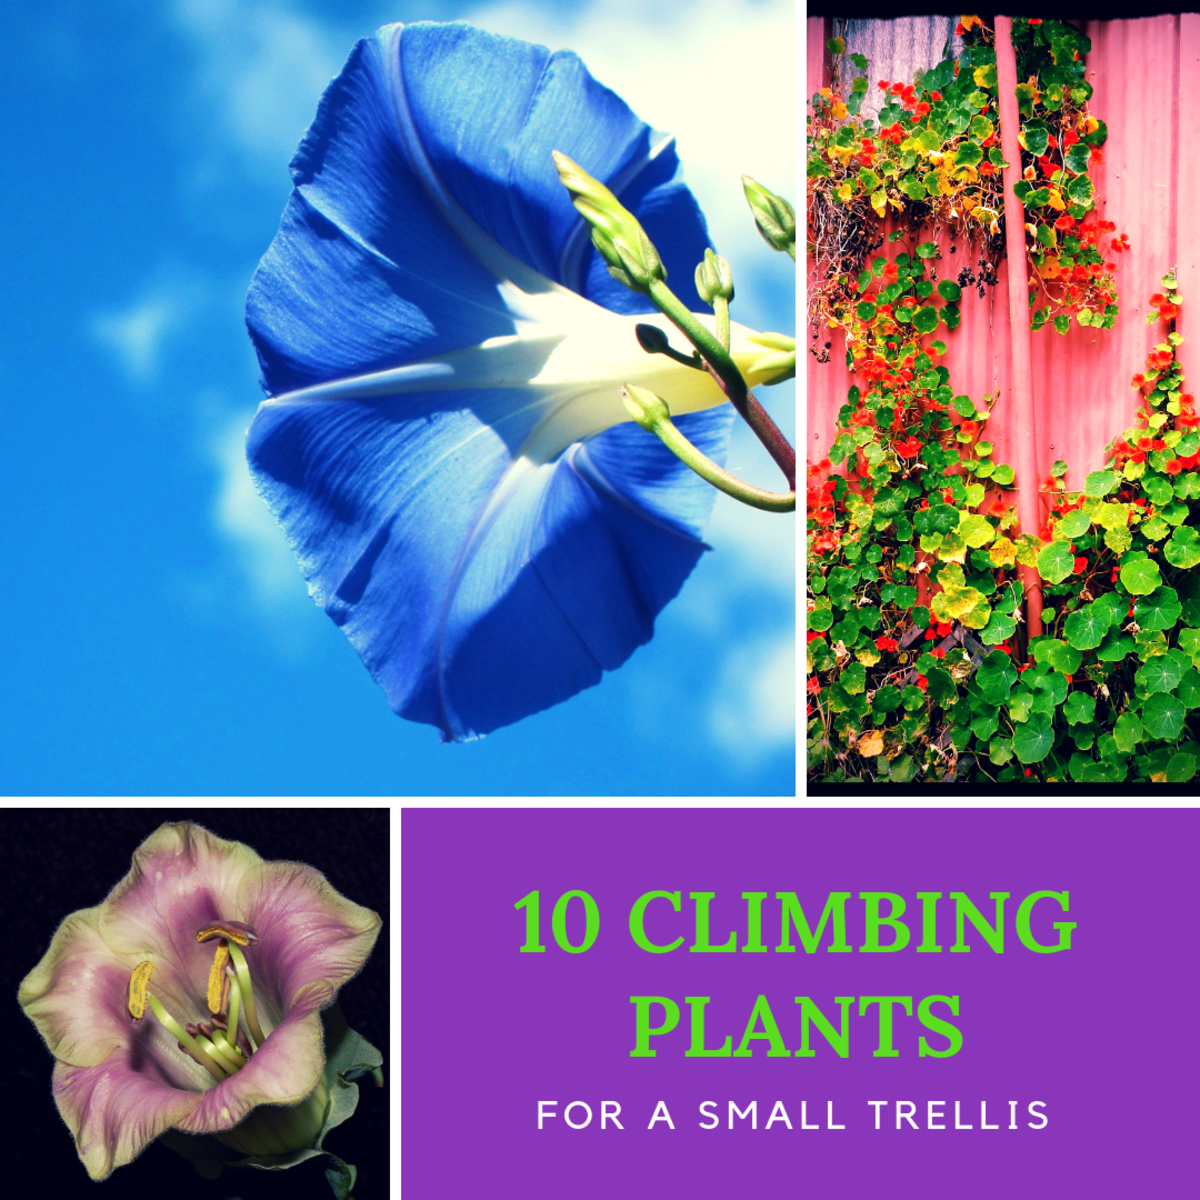 Top 10 Climbing Plants for a Small Trellis